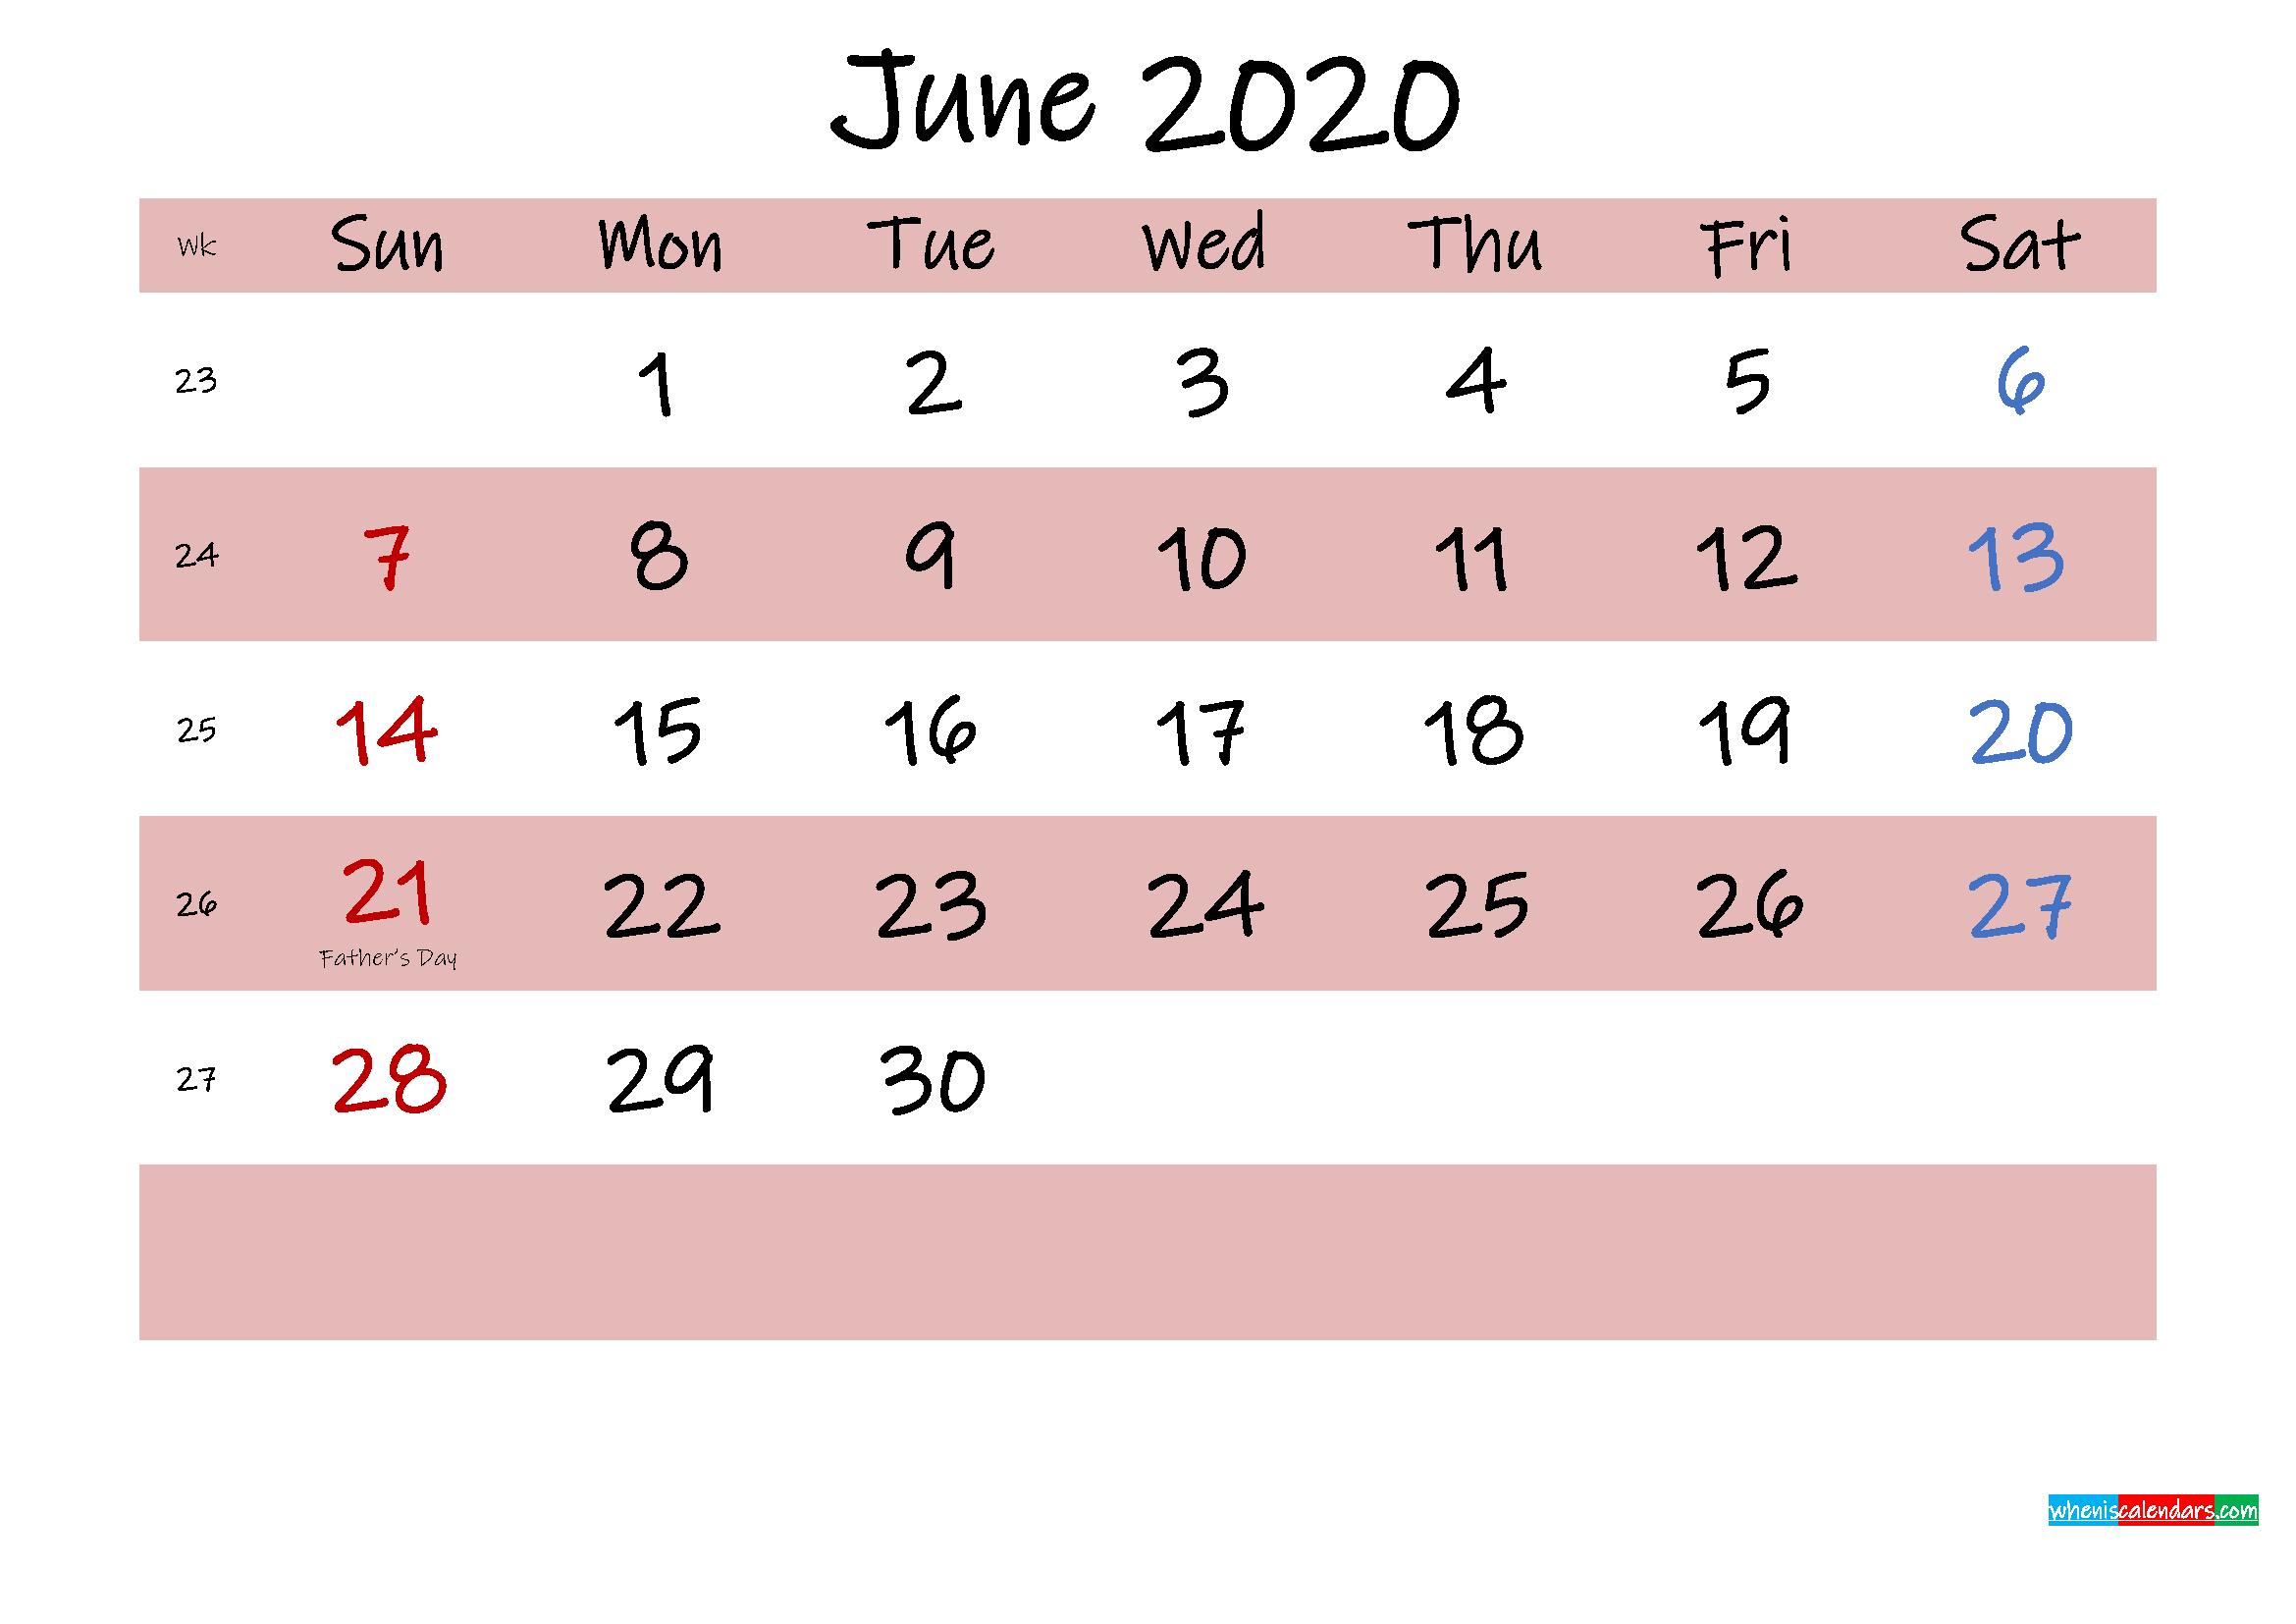 Printable June 2020 Calendar with Holidays